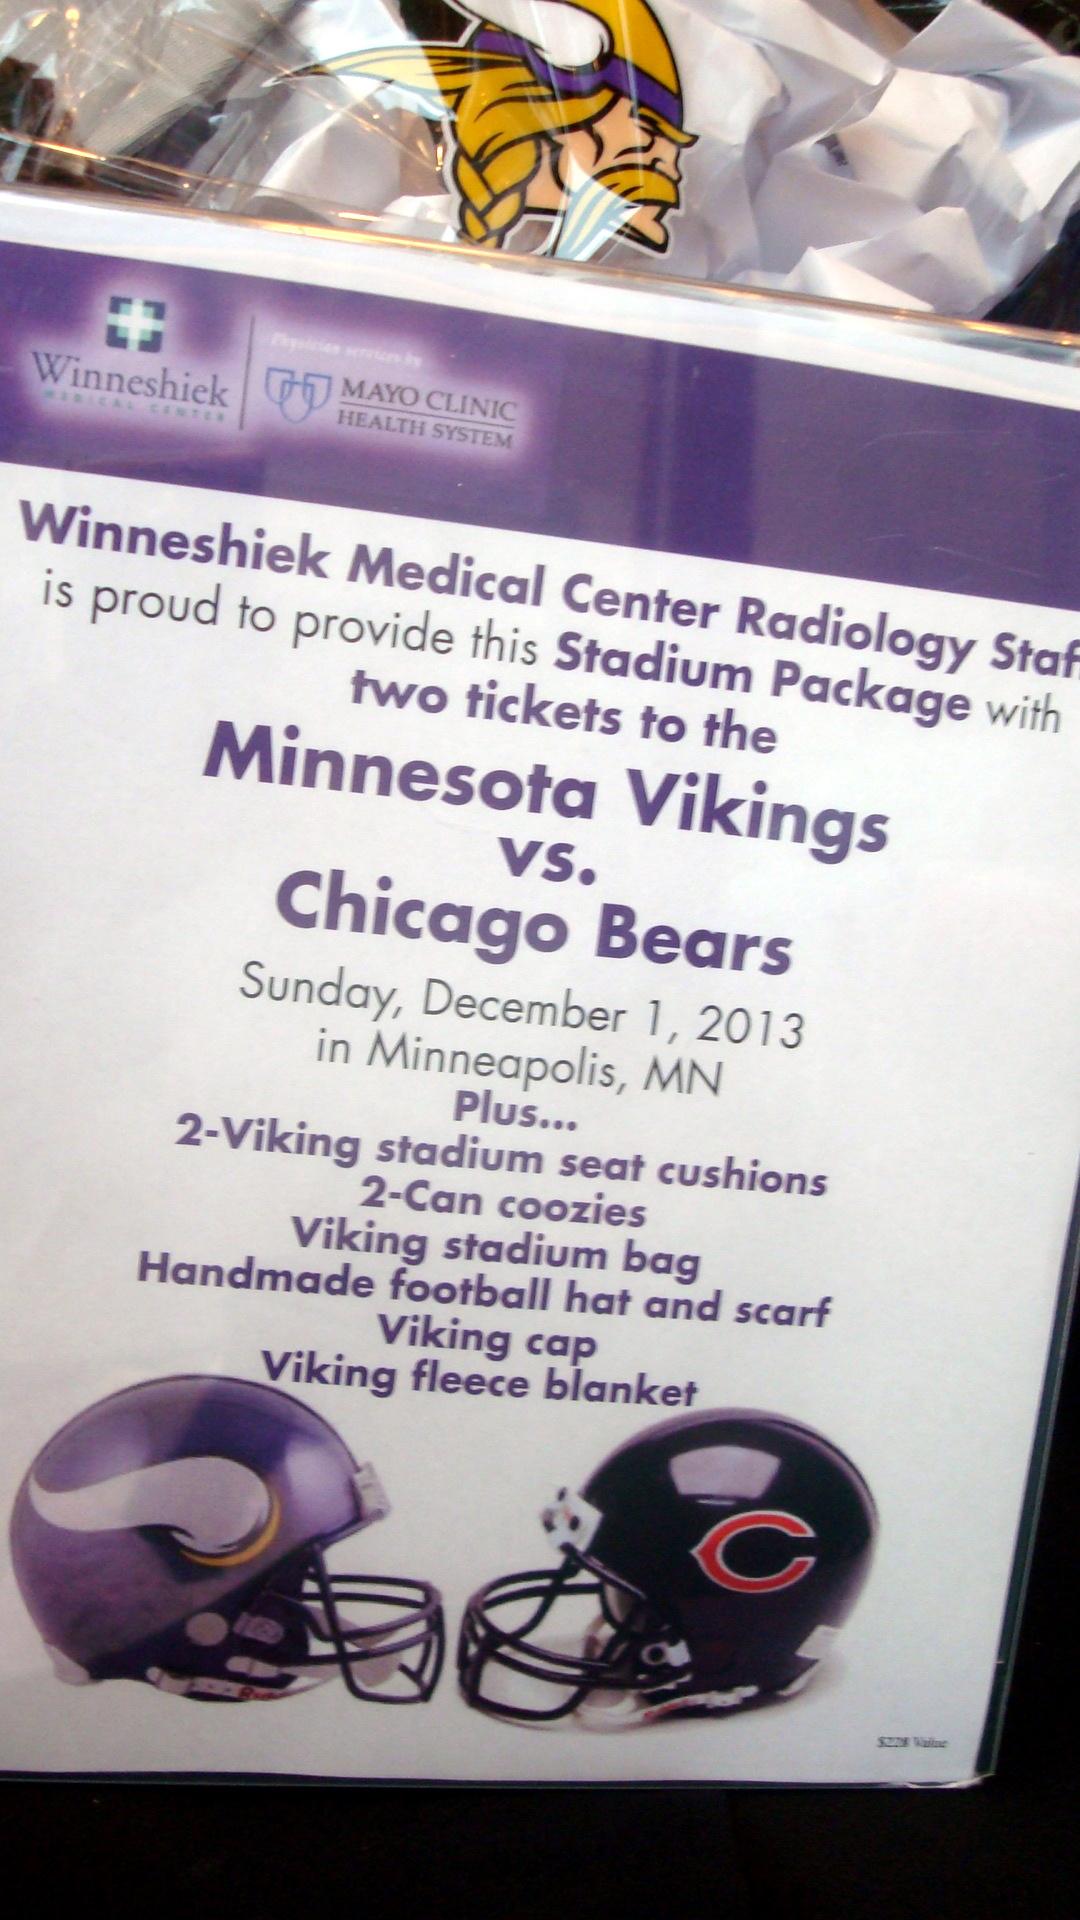 Viking vs. Bears Stadium Package